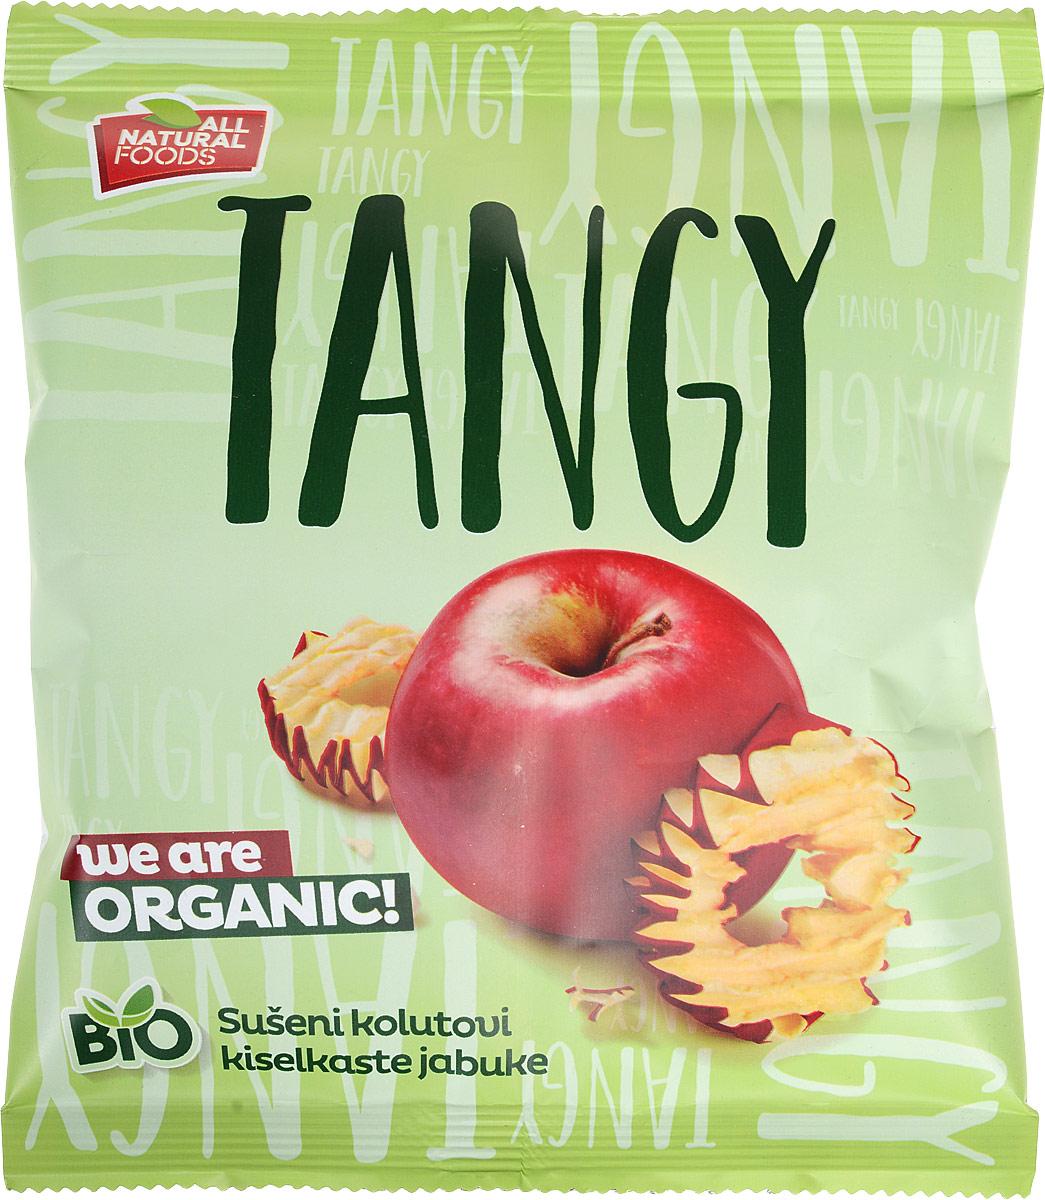 All Natural Foods сушеные колечки яблок кислый сорт, 20 г frankie welikhe natural resource management